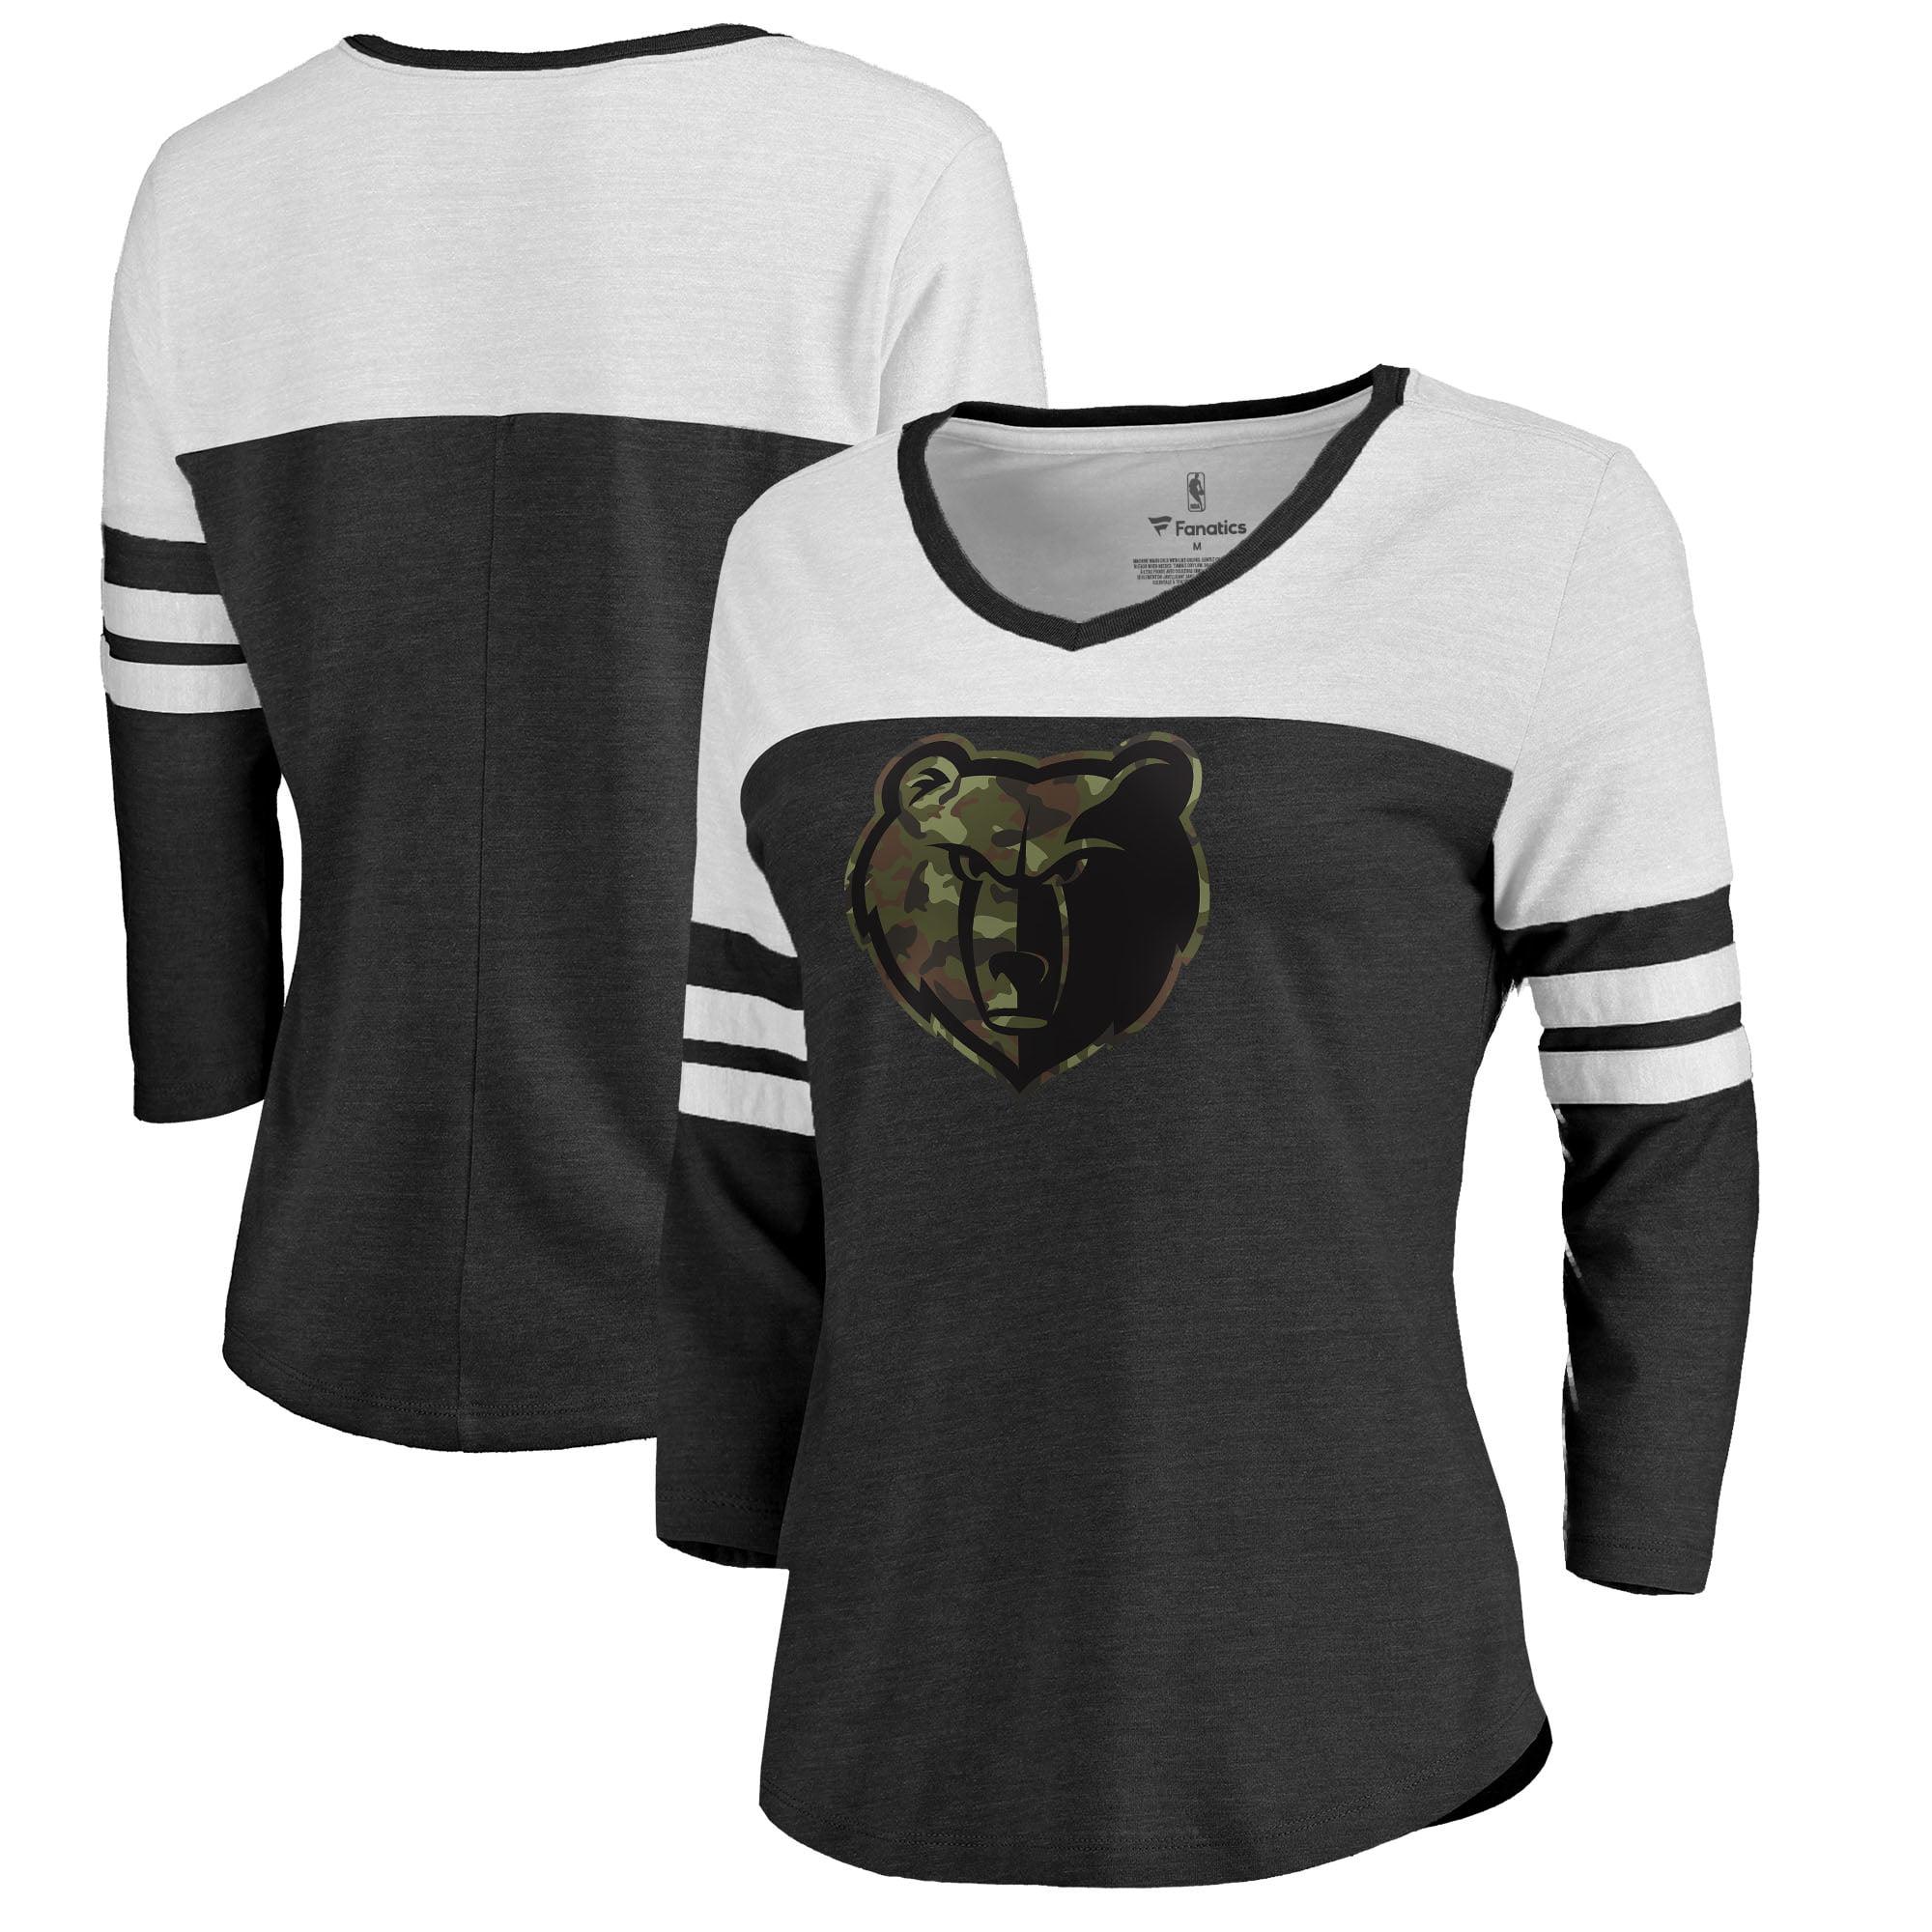 Memphis Grizzlies Fanatics Branded Women's Prestige Camo 3/4-Sleeve Raglan V-Neck T-Shirt - Black